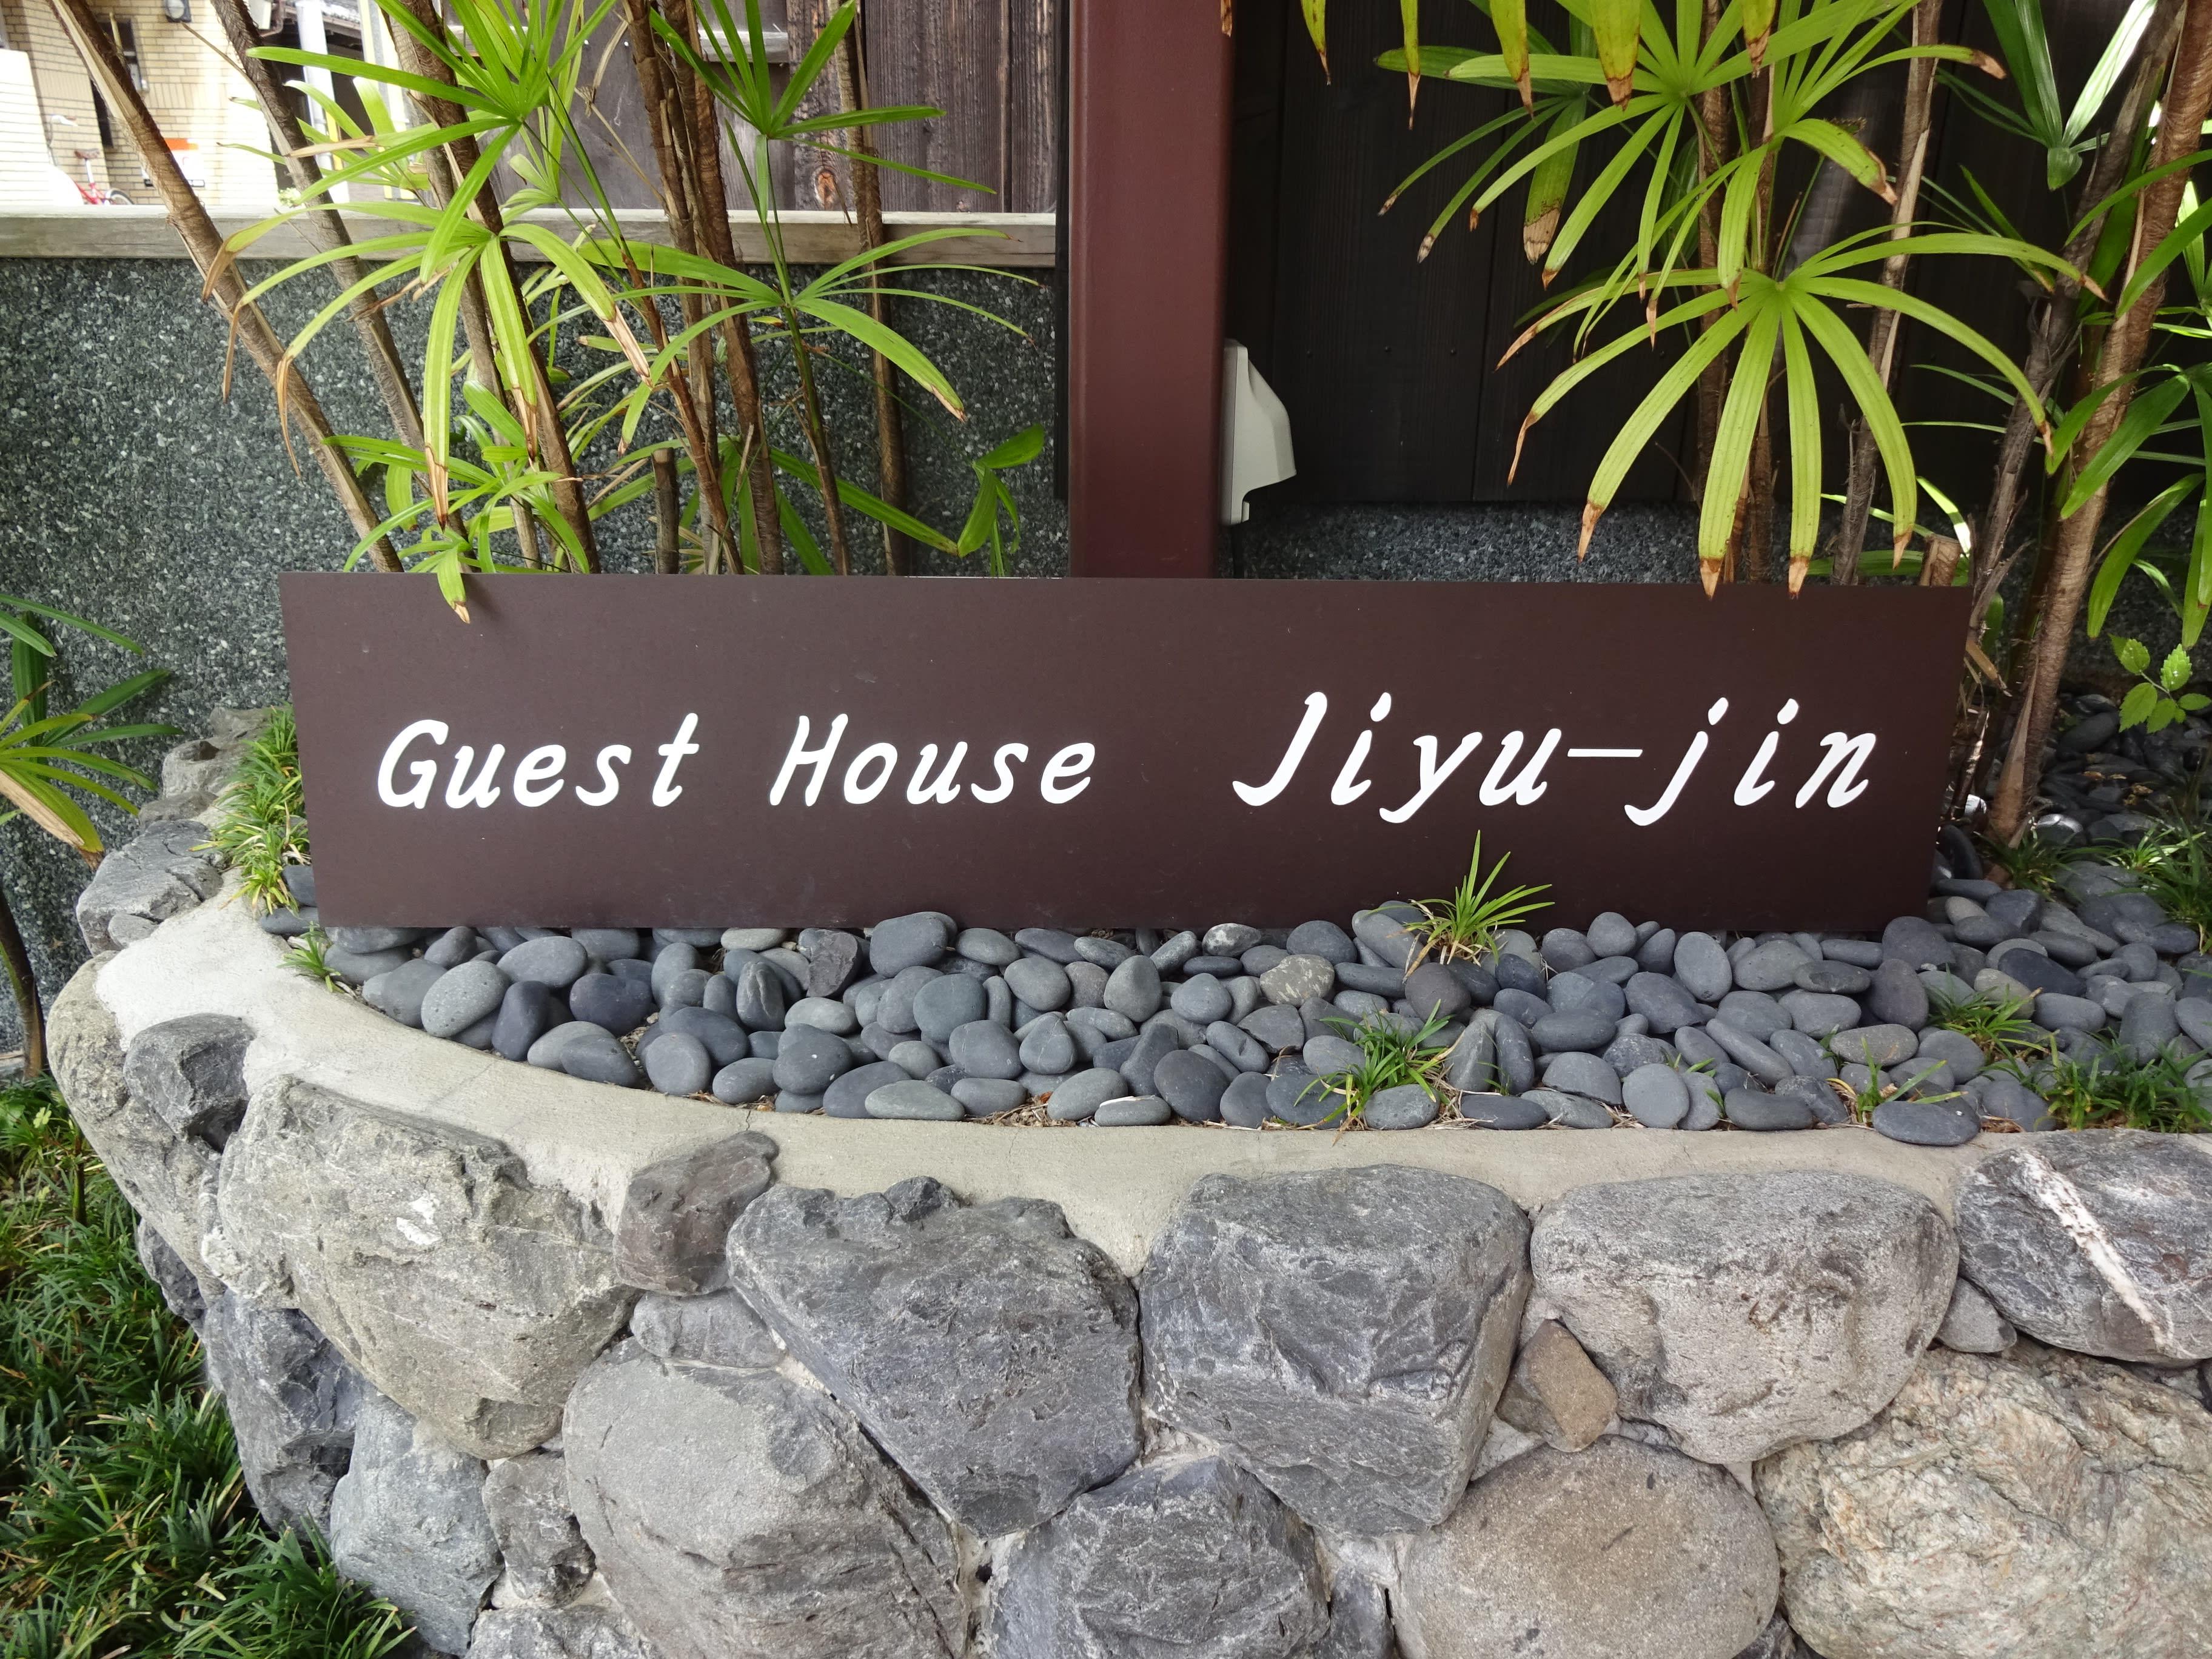 Jiyujin